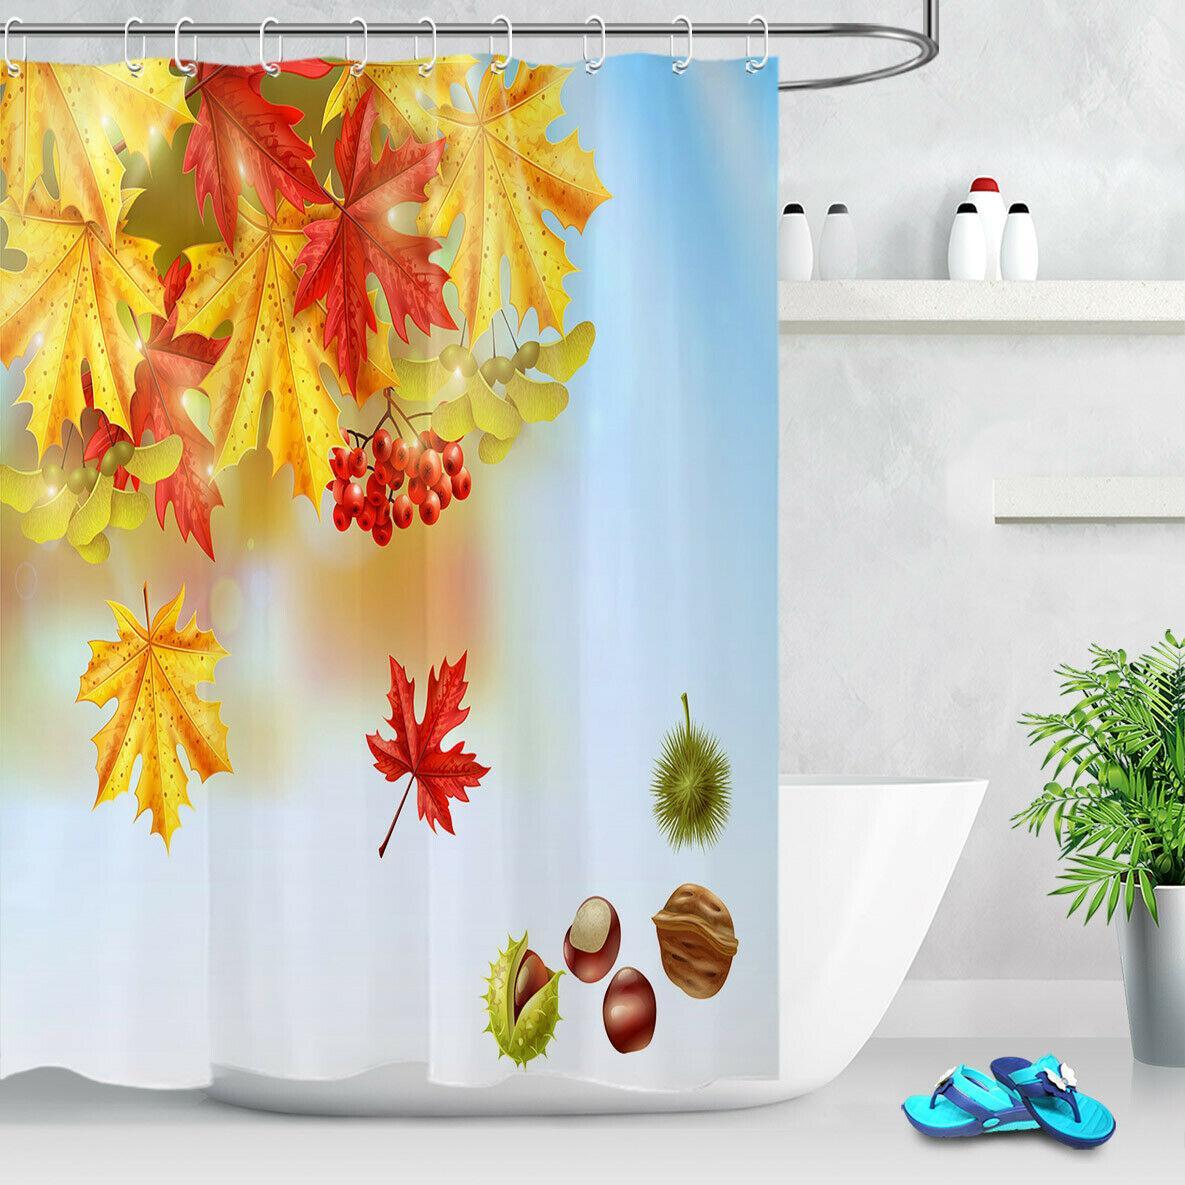 2019 Autumn Maple Leaf Nut Red Firethorndurable Fabric Mold Proof Bathroom Pendant Creative With 12 Hooks 180x180cm From Jackdaine 22 02